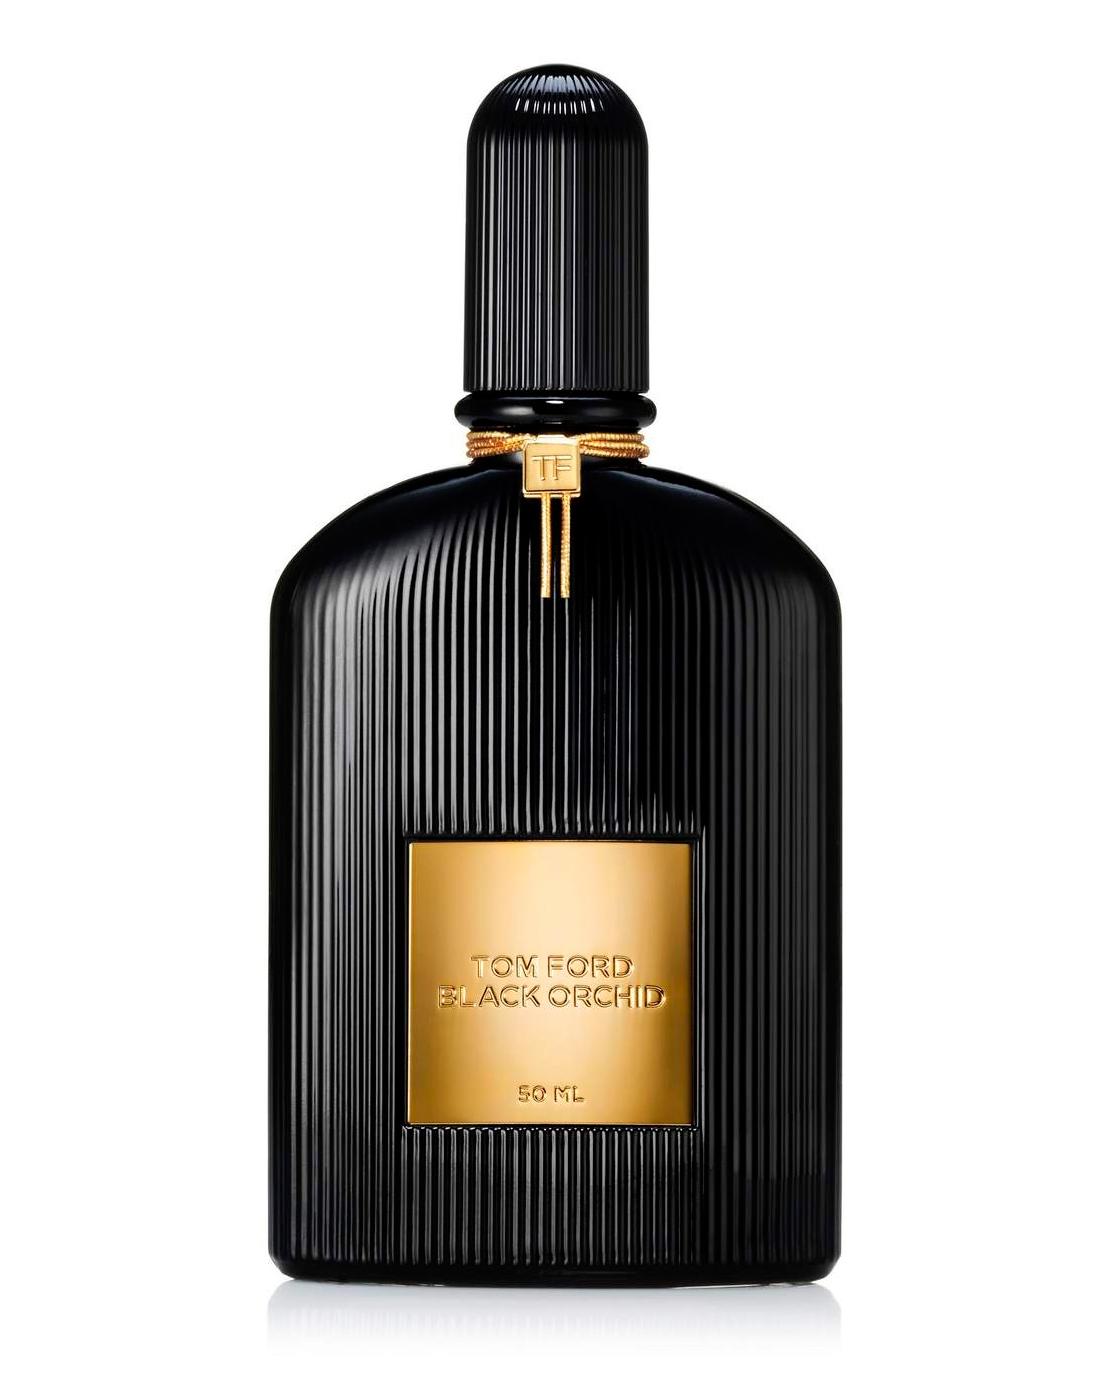 love-potion-tom-ford-black-orchid-0715.jpg